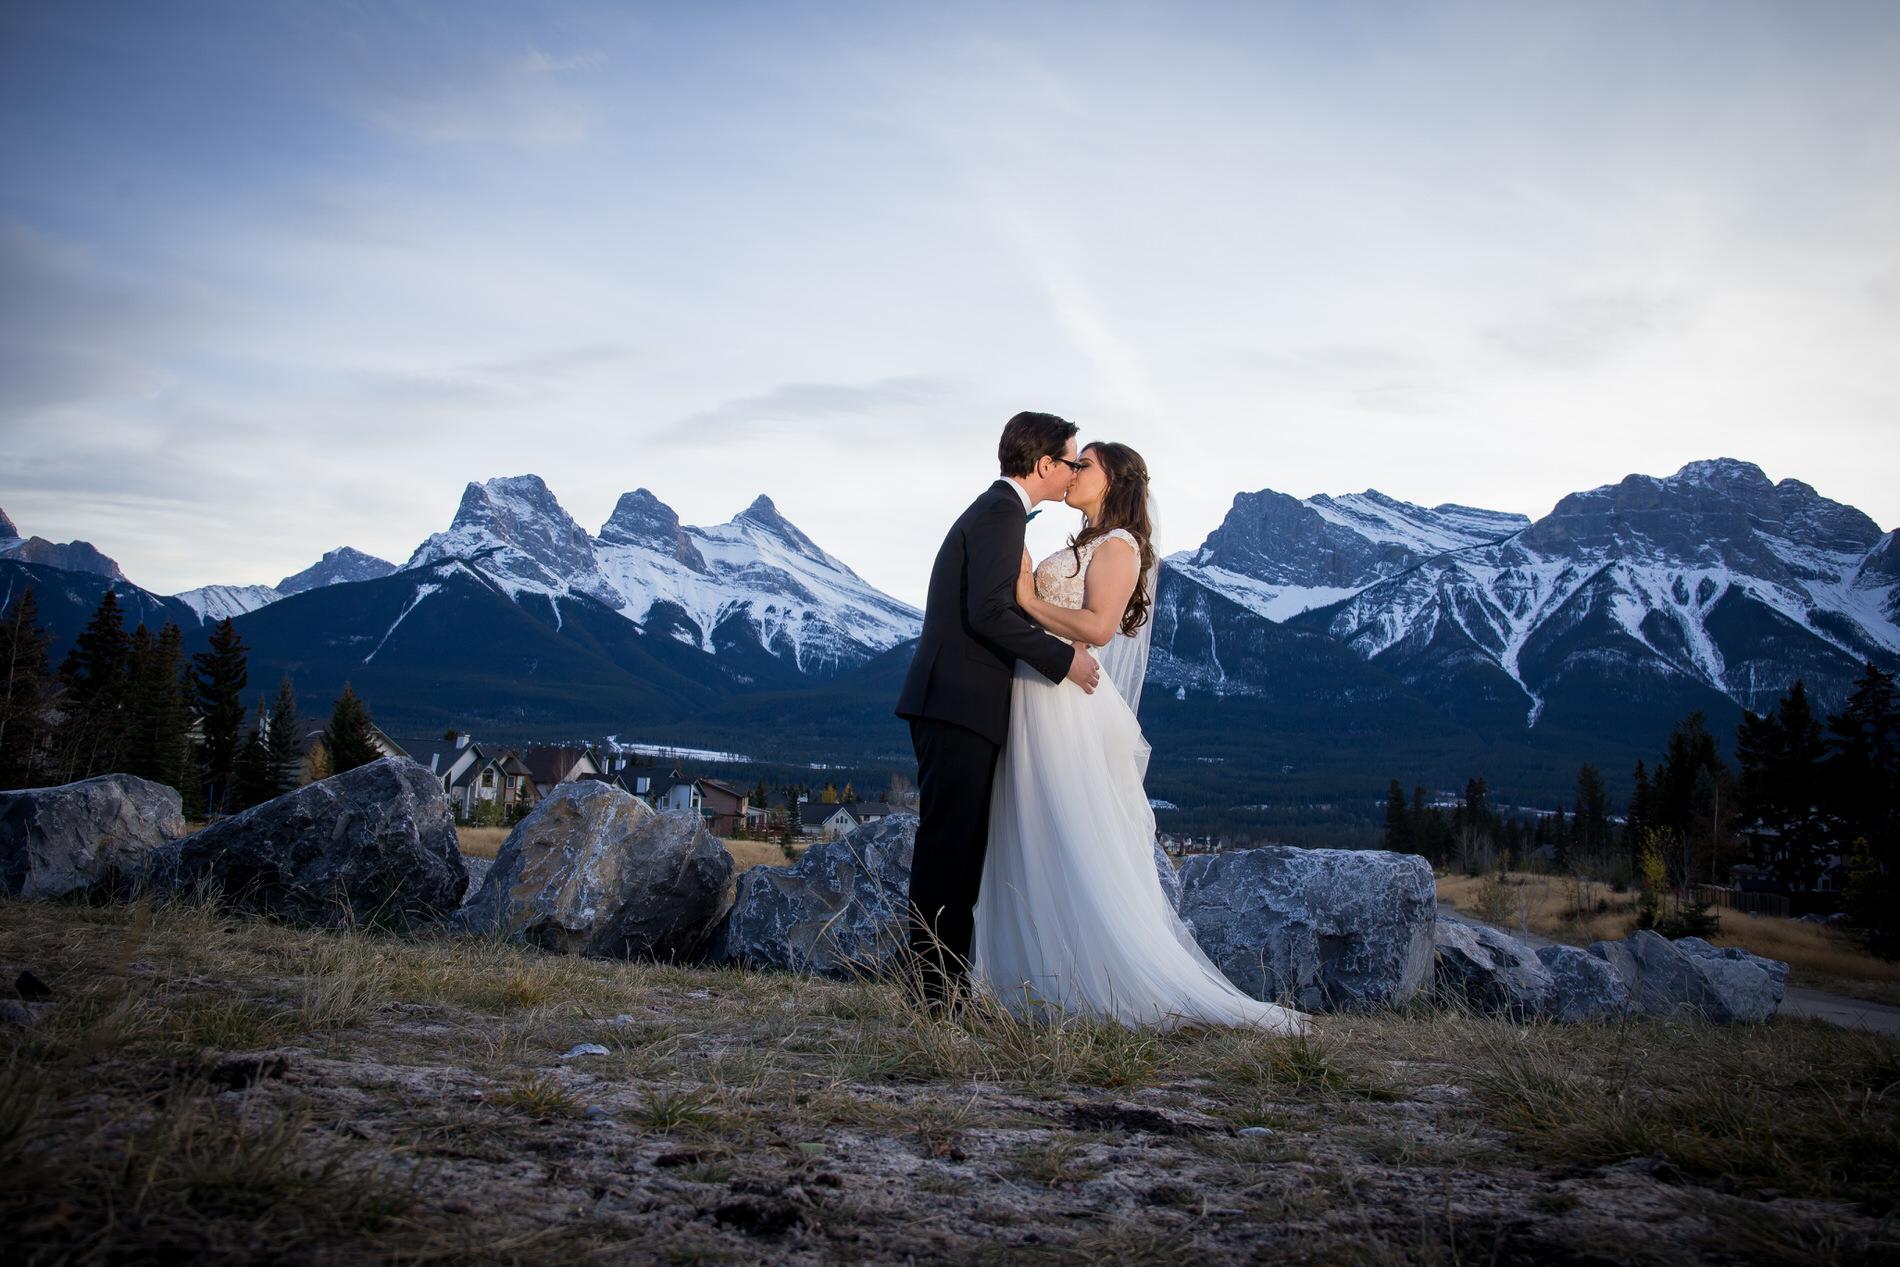 Kira and John Wedding-Brianna-037.jpg